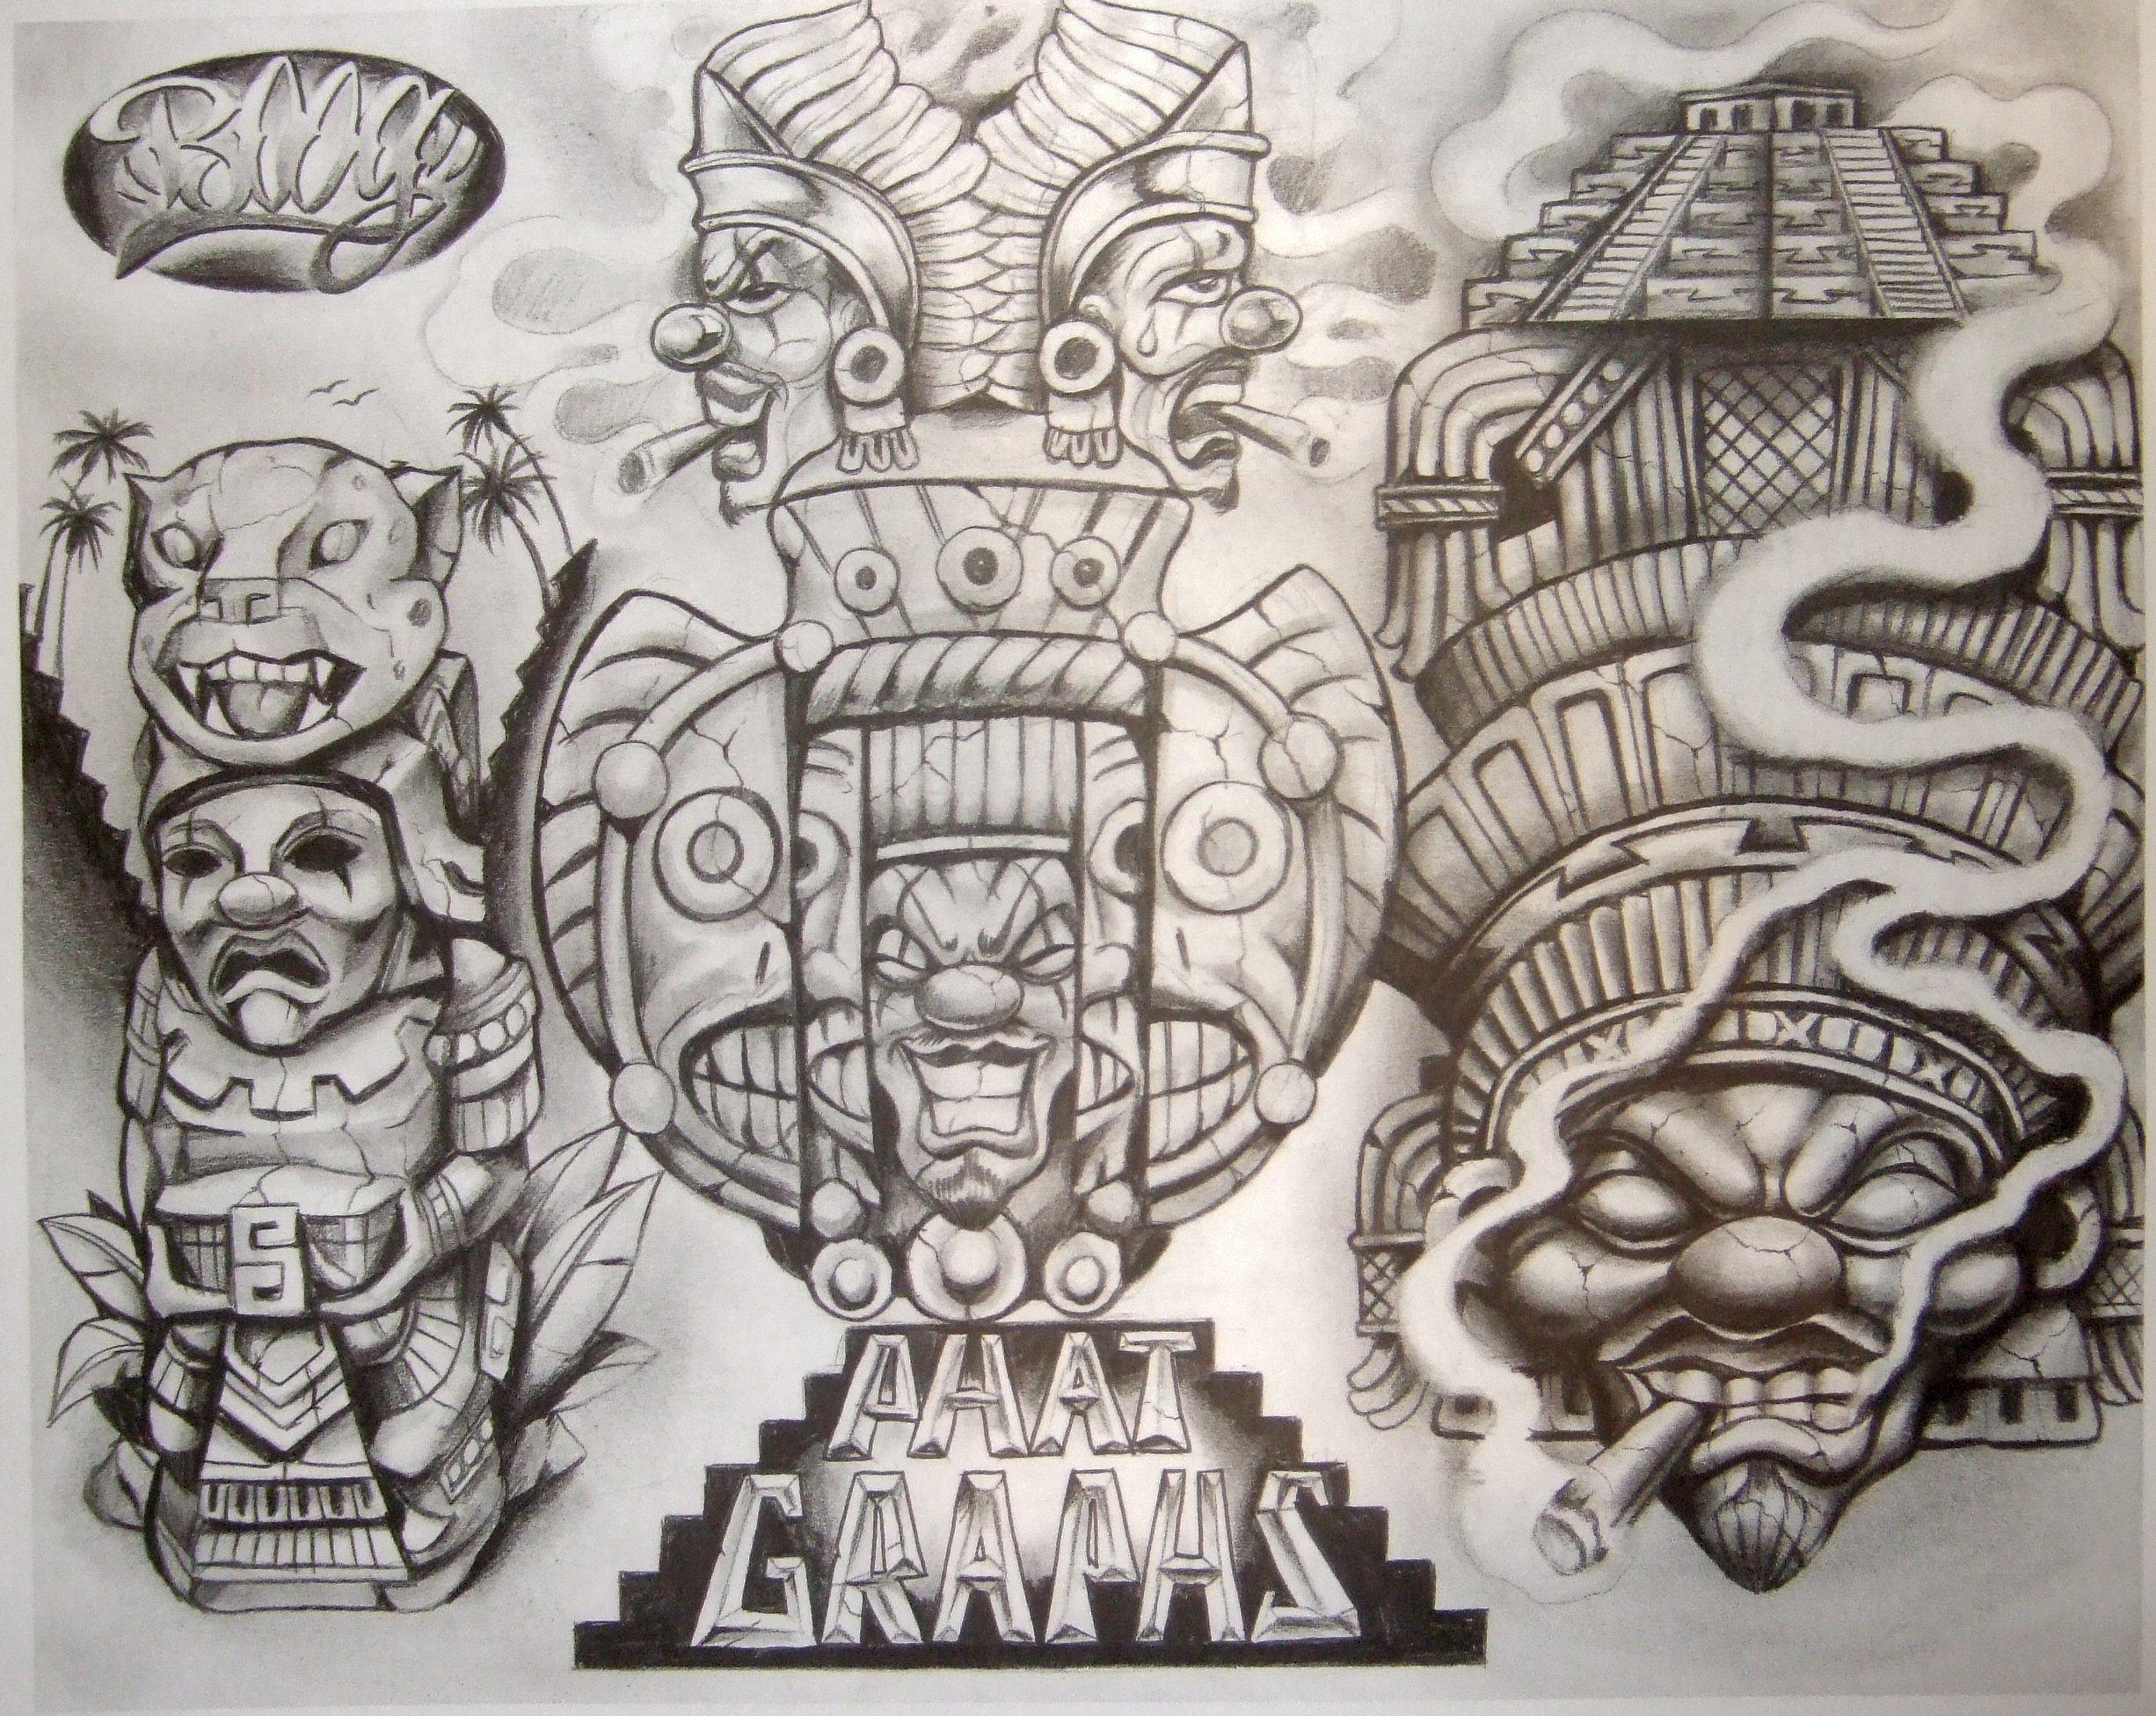 Tattoo Flash Art Black And White Guitar: Pictures Boog Flash Black And Grey Tattoos Tattoo Artists